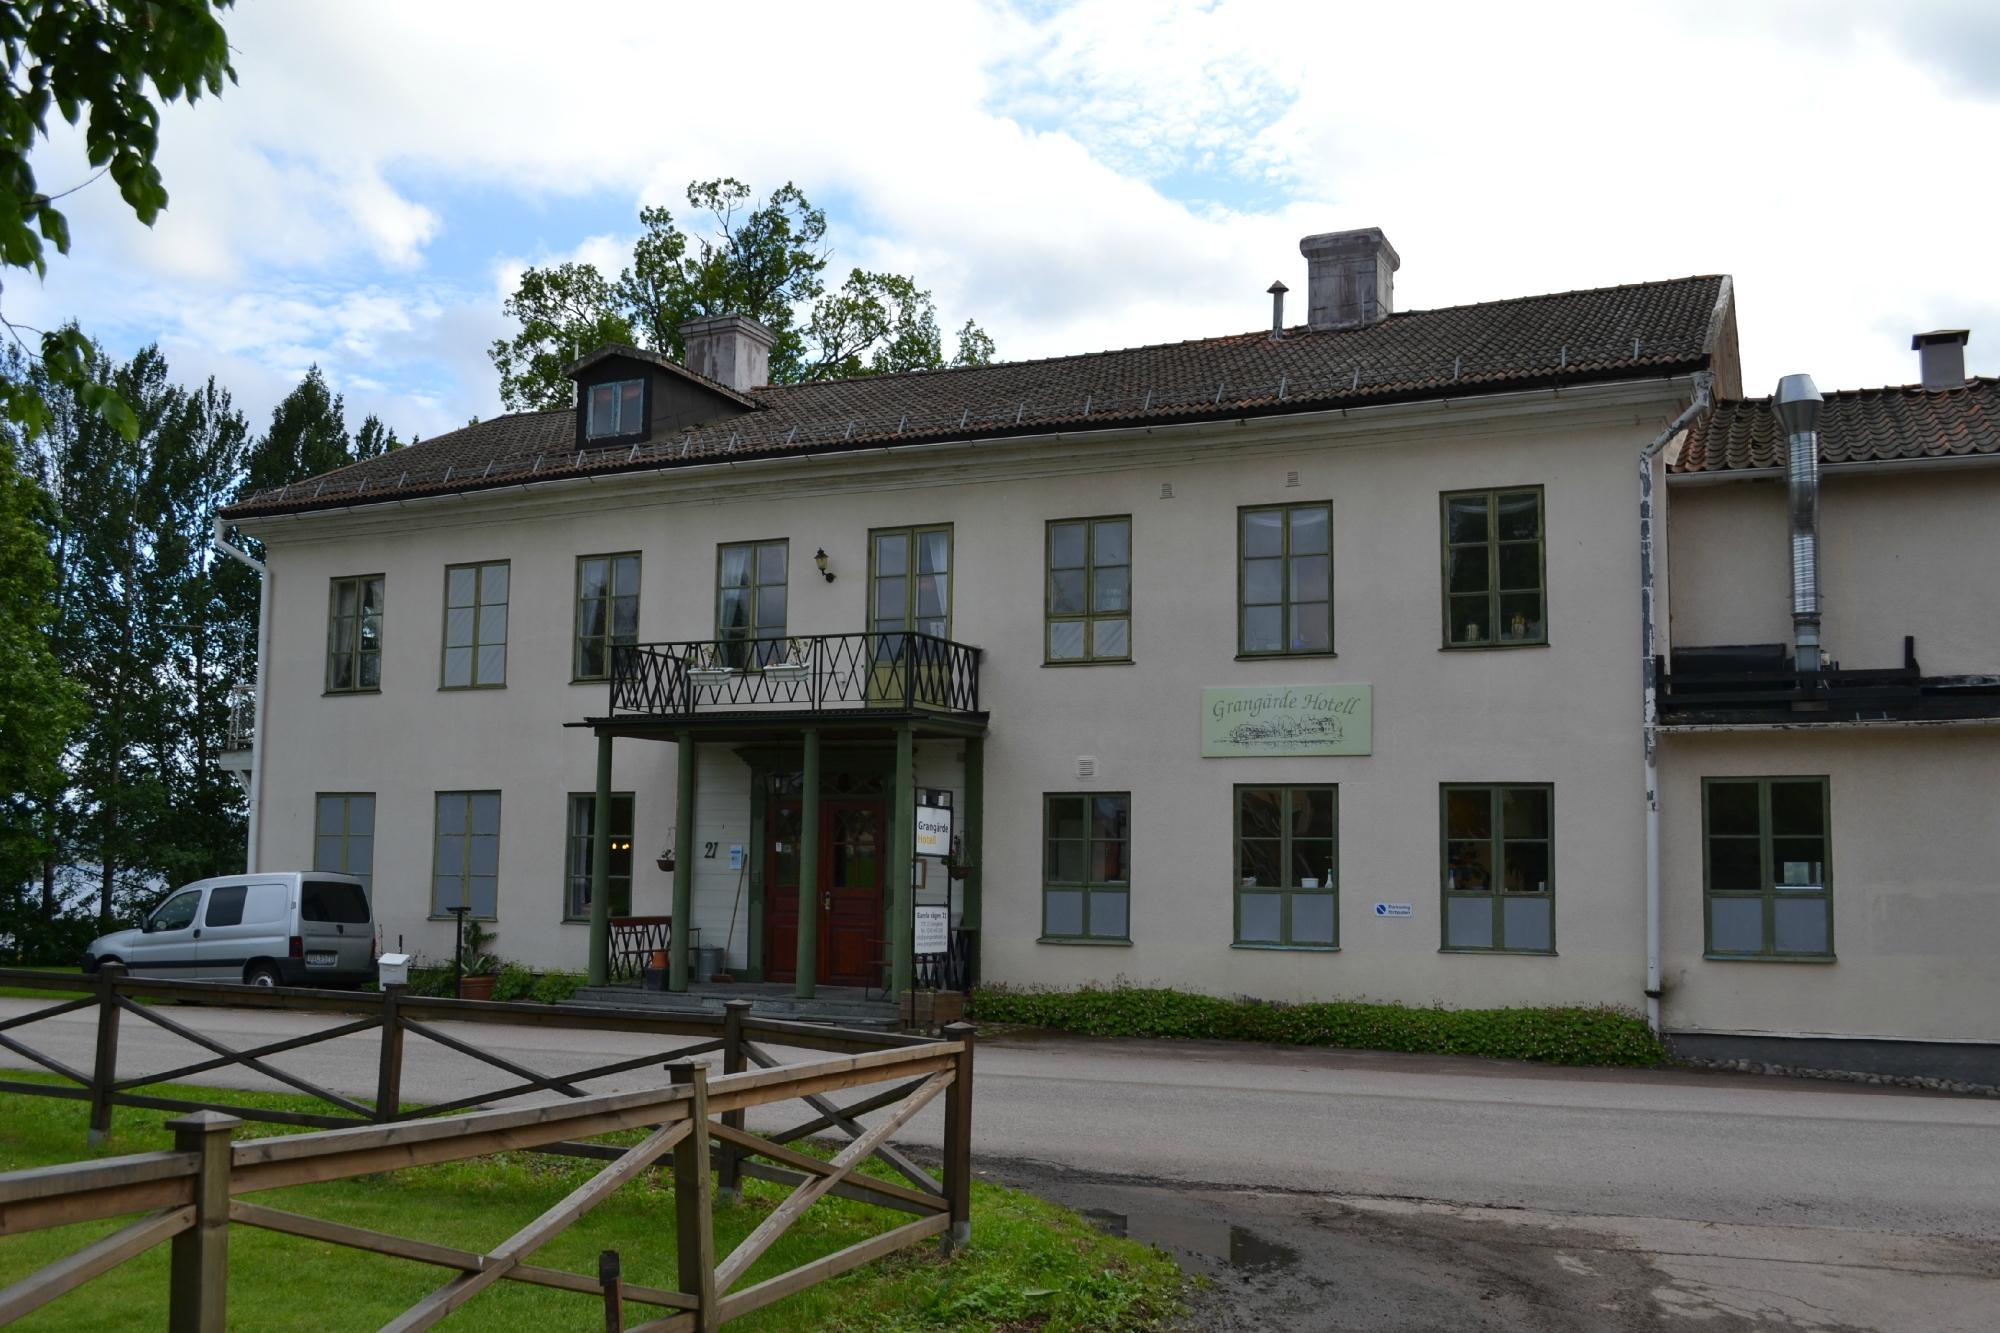 Grangarde Hotell & Konferens